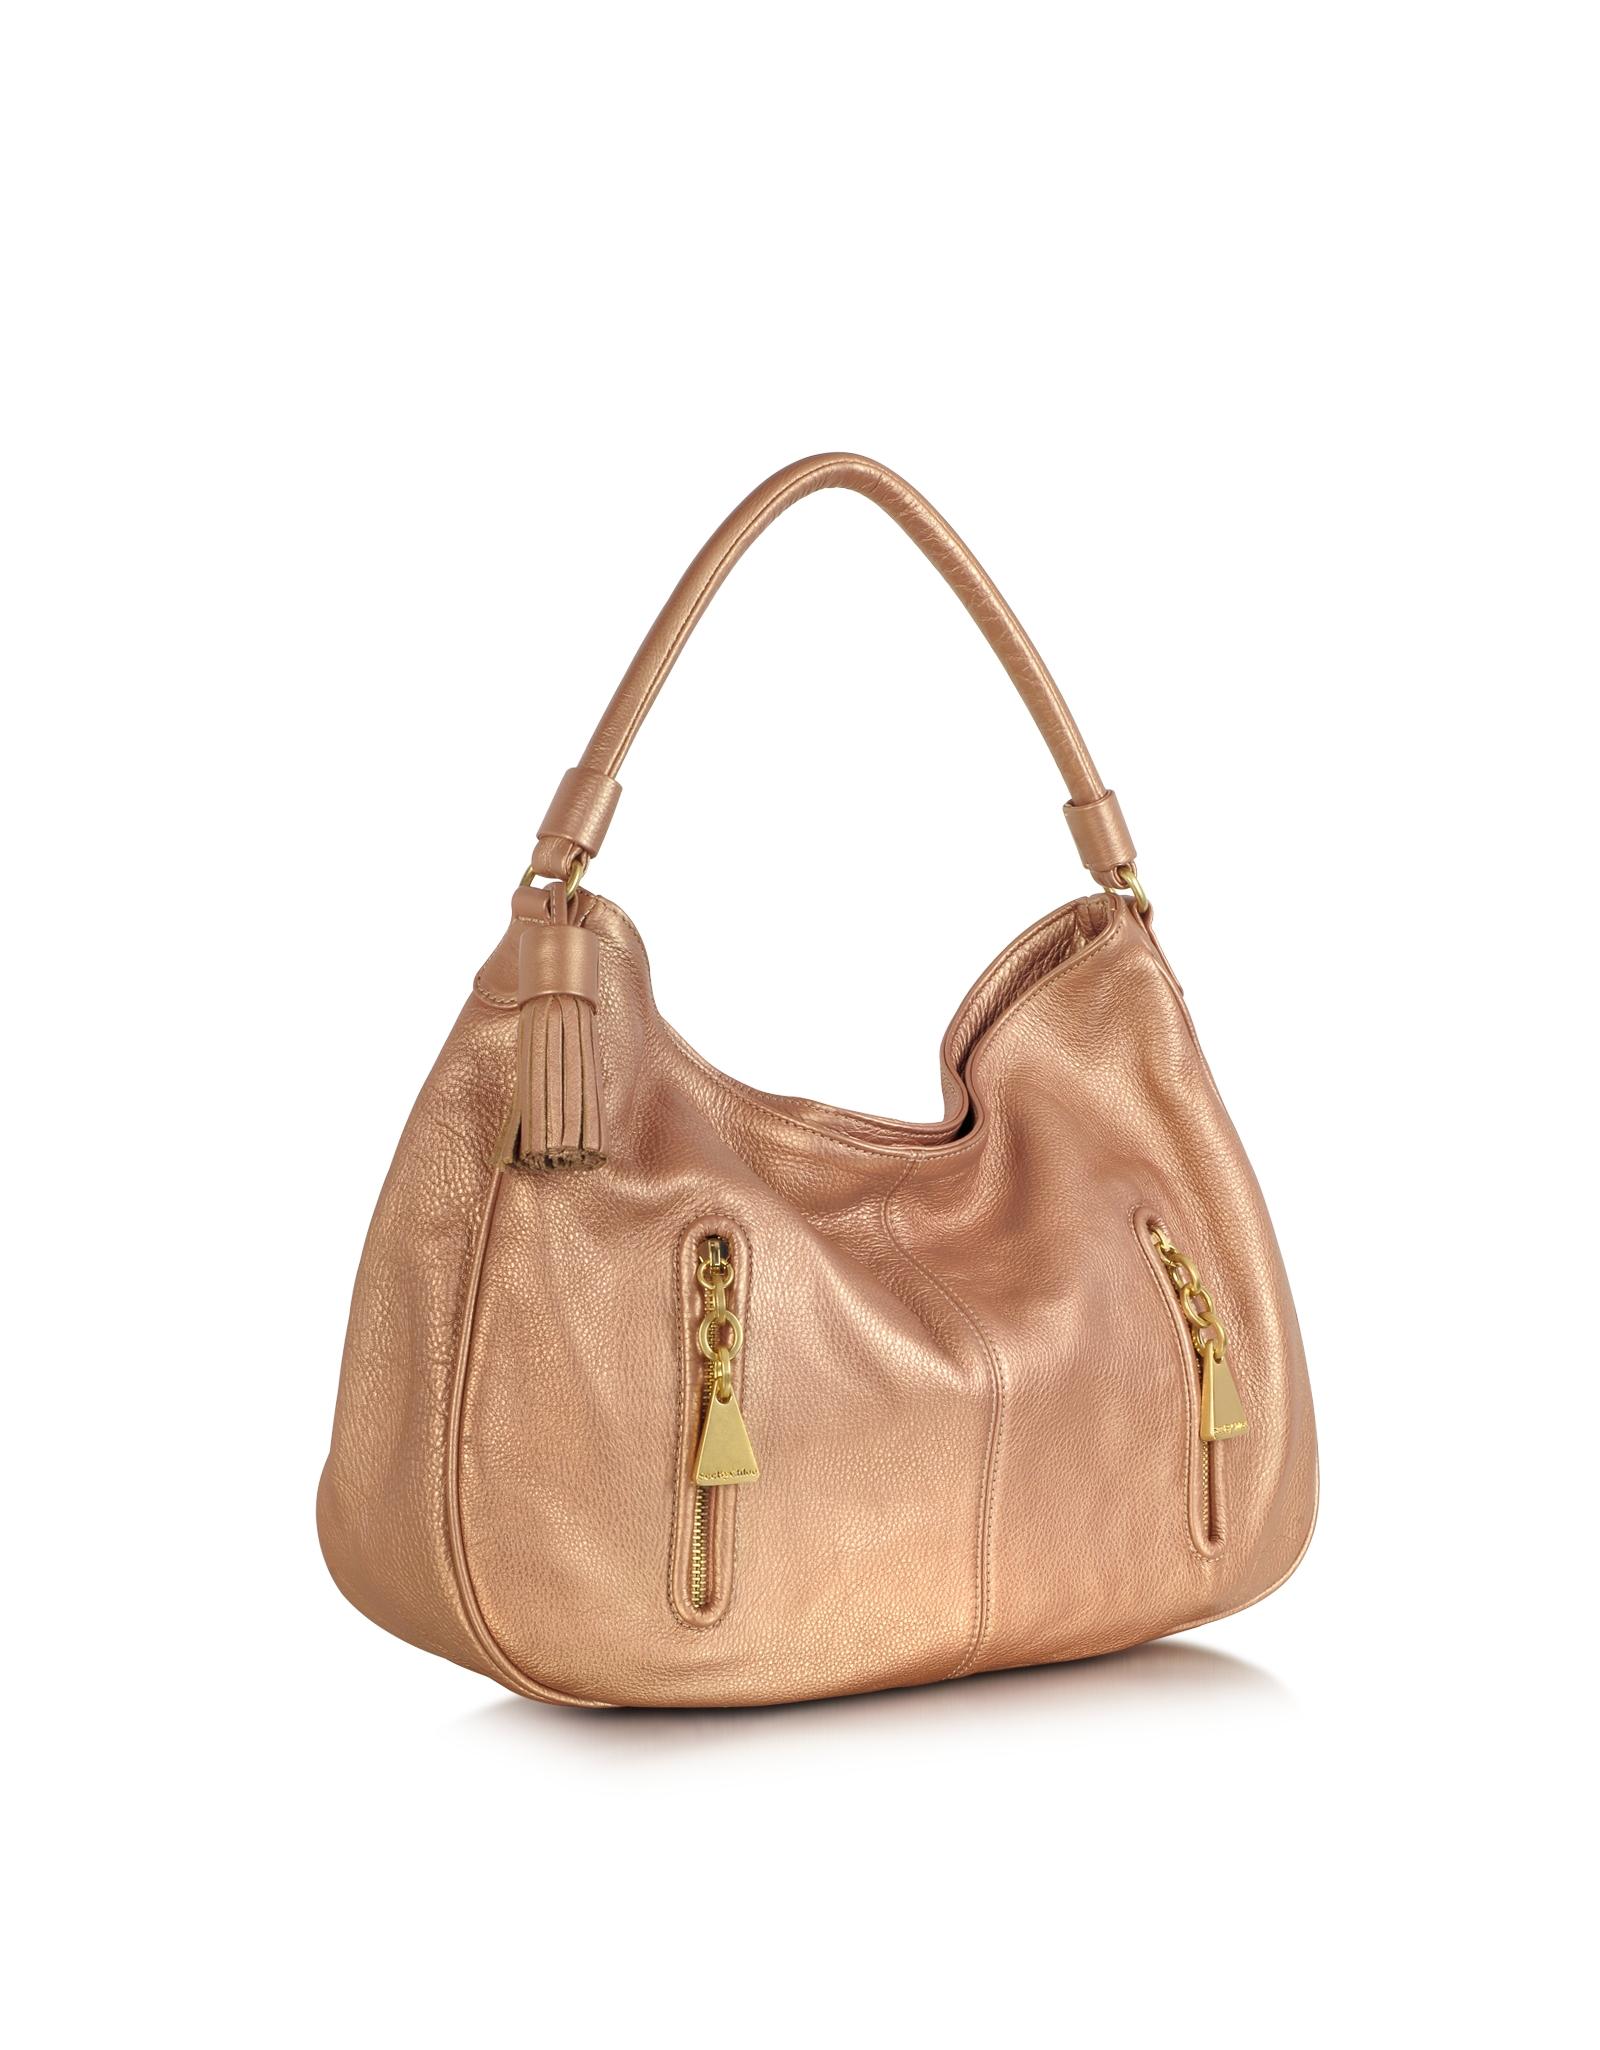 Chlo 233 Pink Champagne Metallic Leather Hobo Bag Lyst